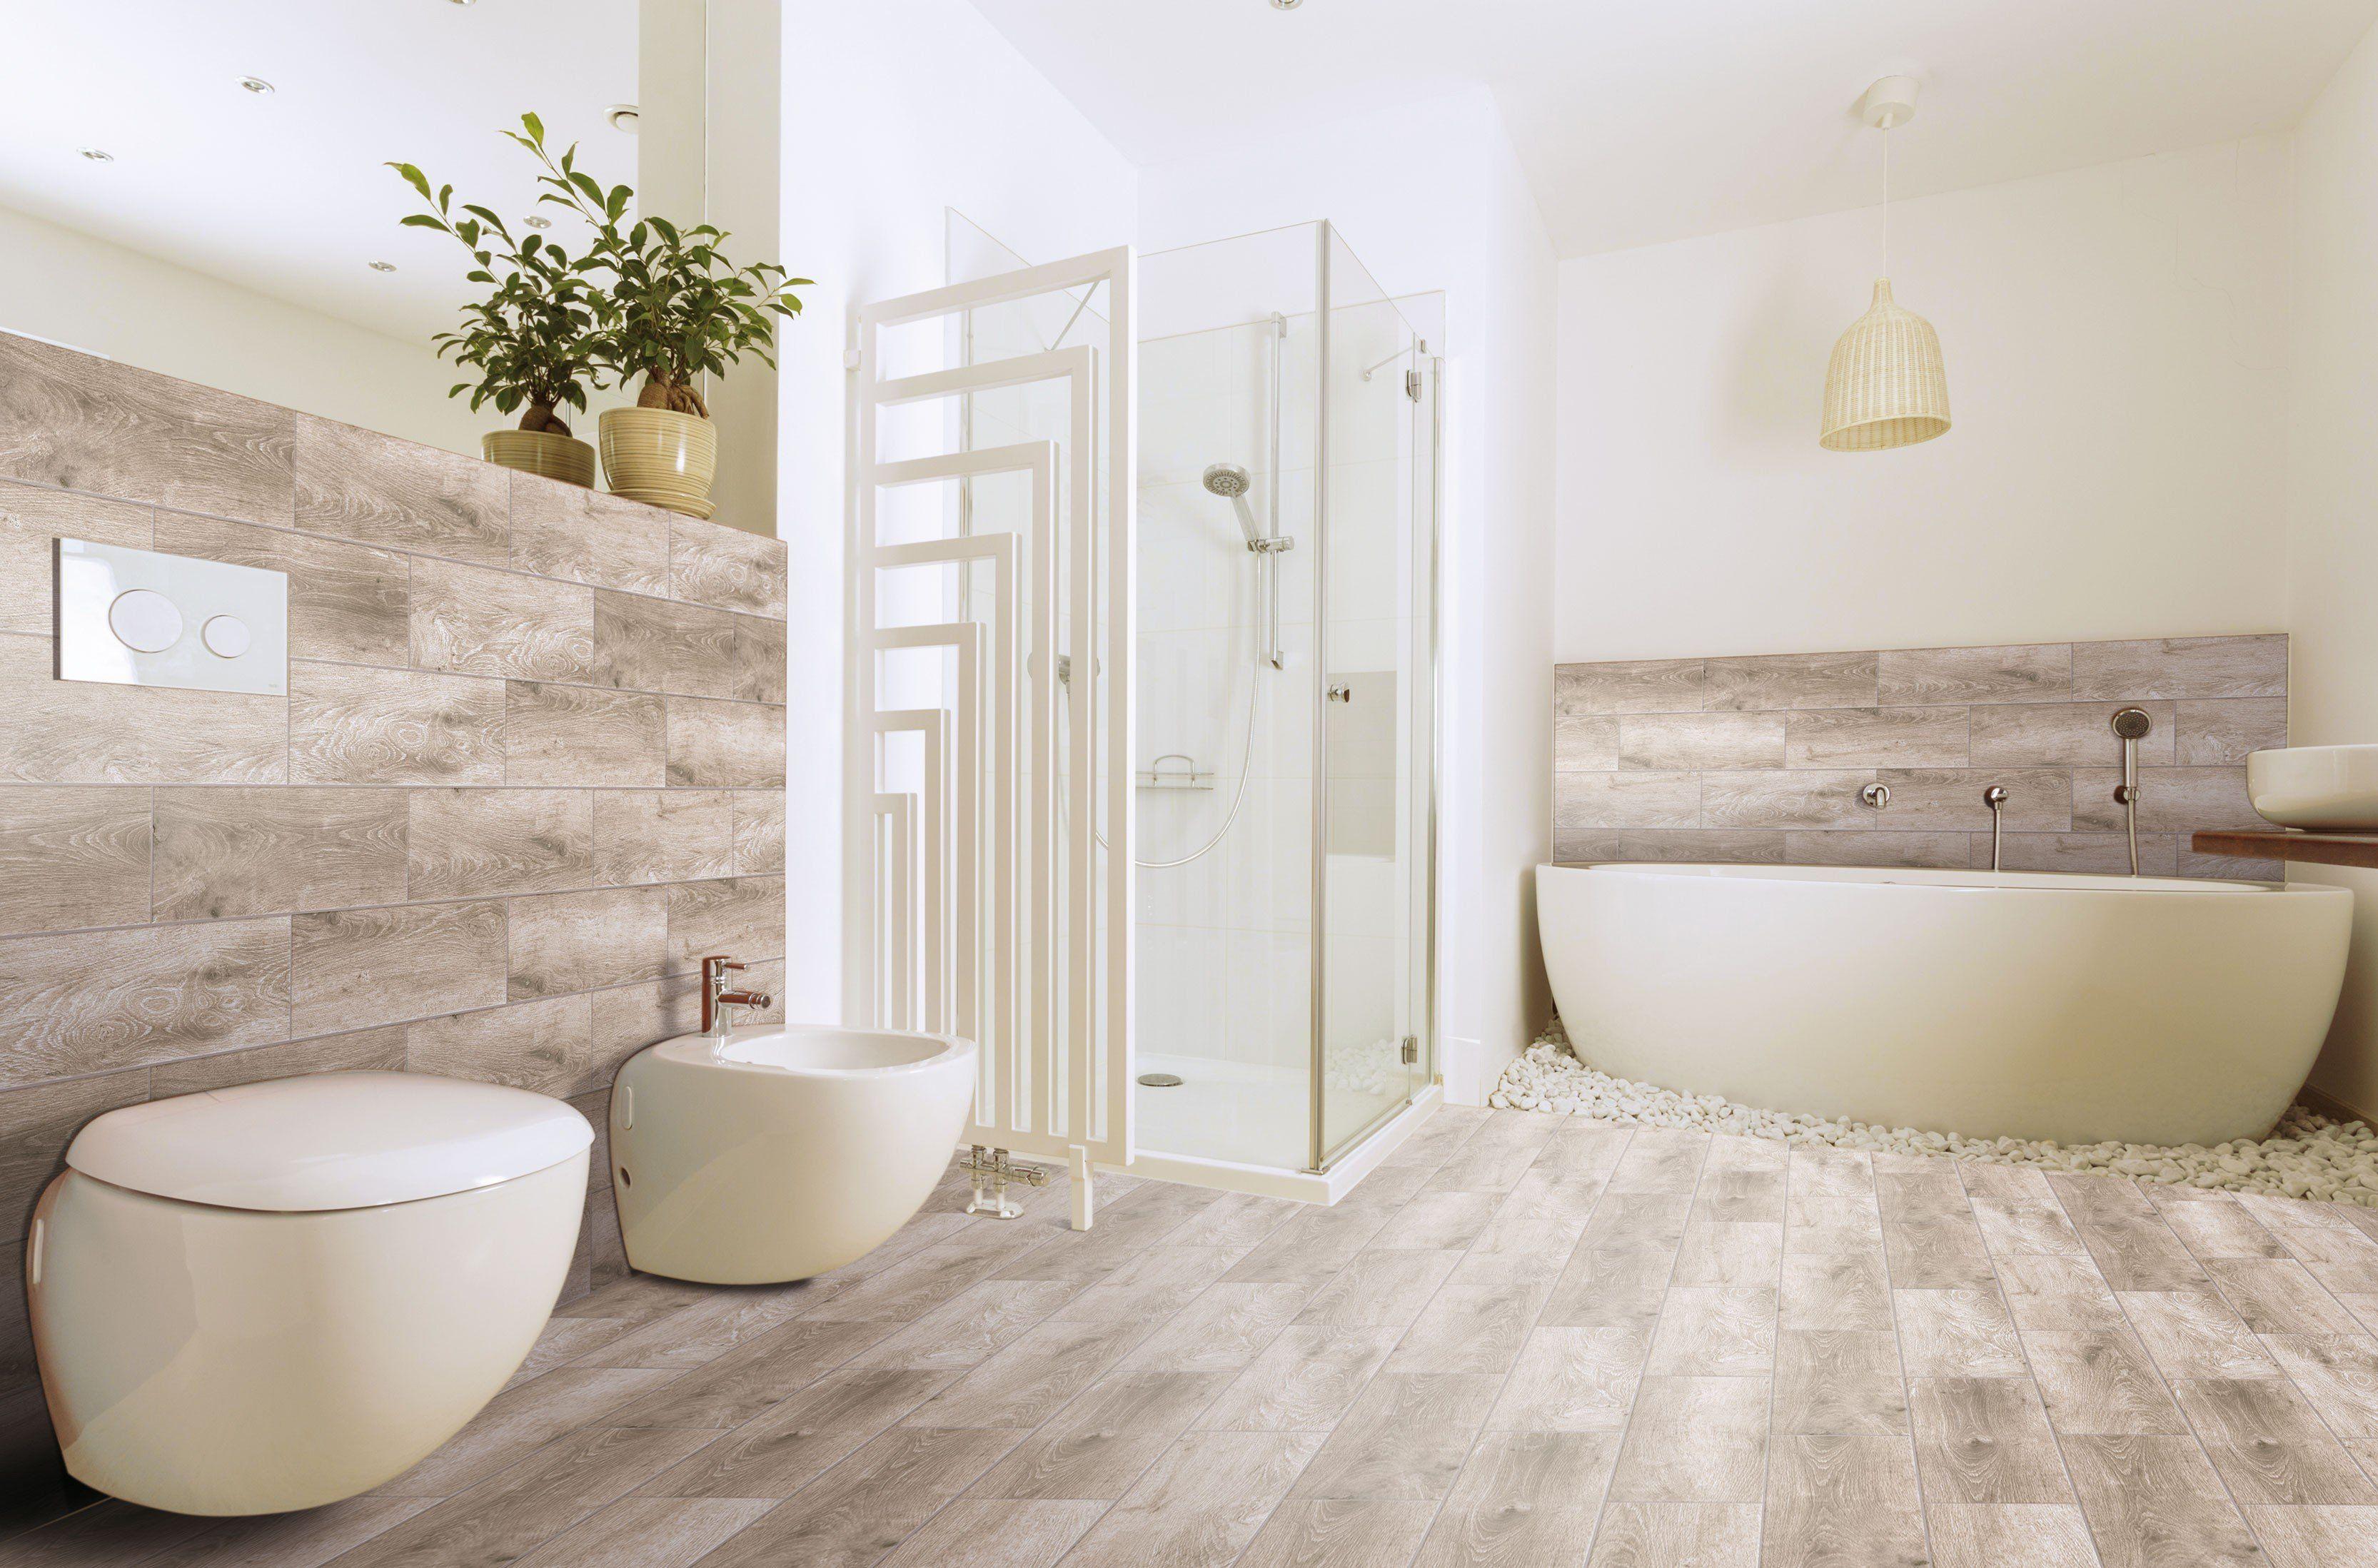 Alpes Greige Wood Effect Floor Tile | Tile floor, Wood ...